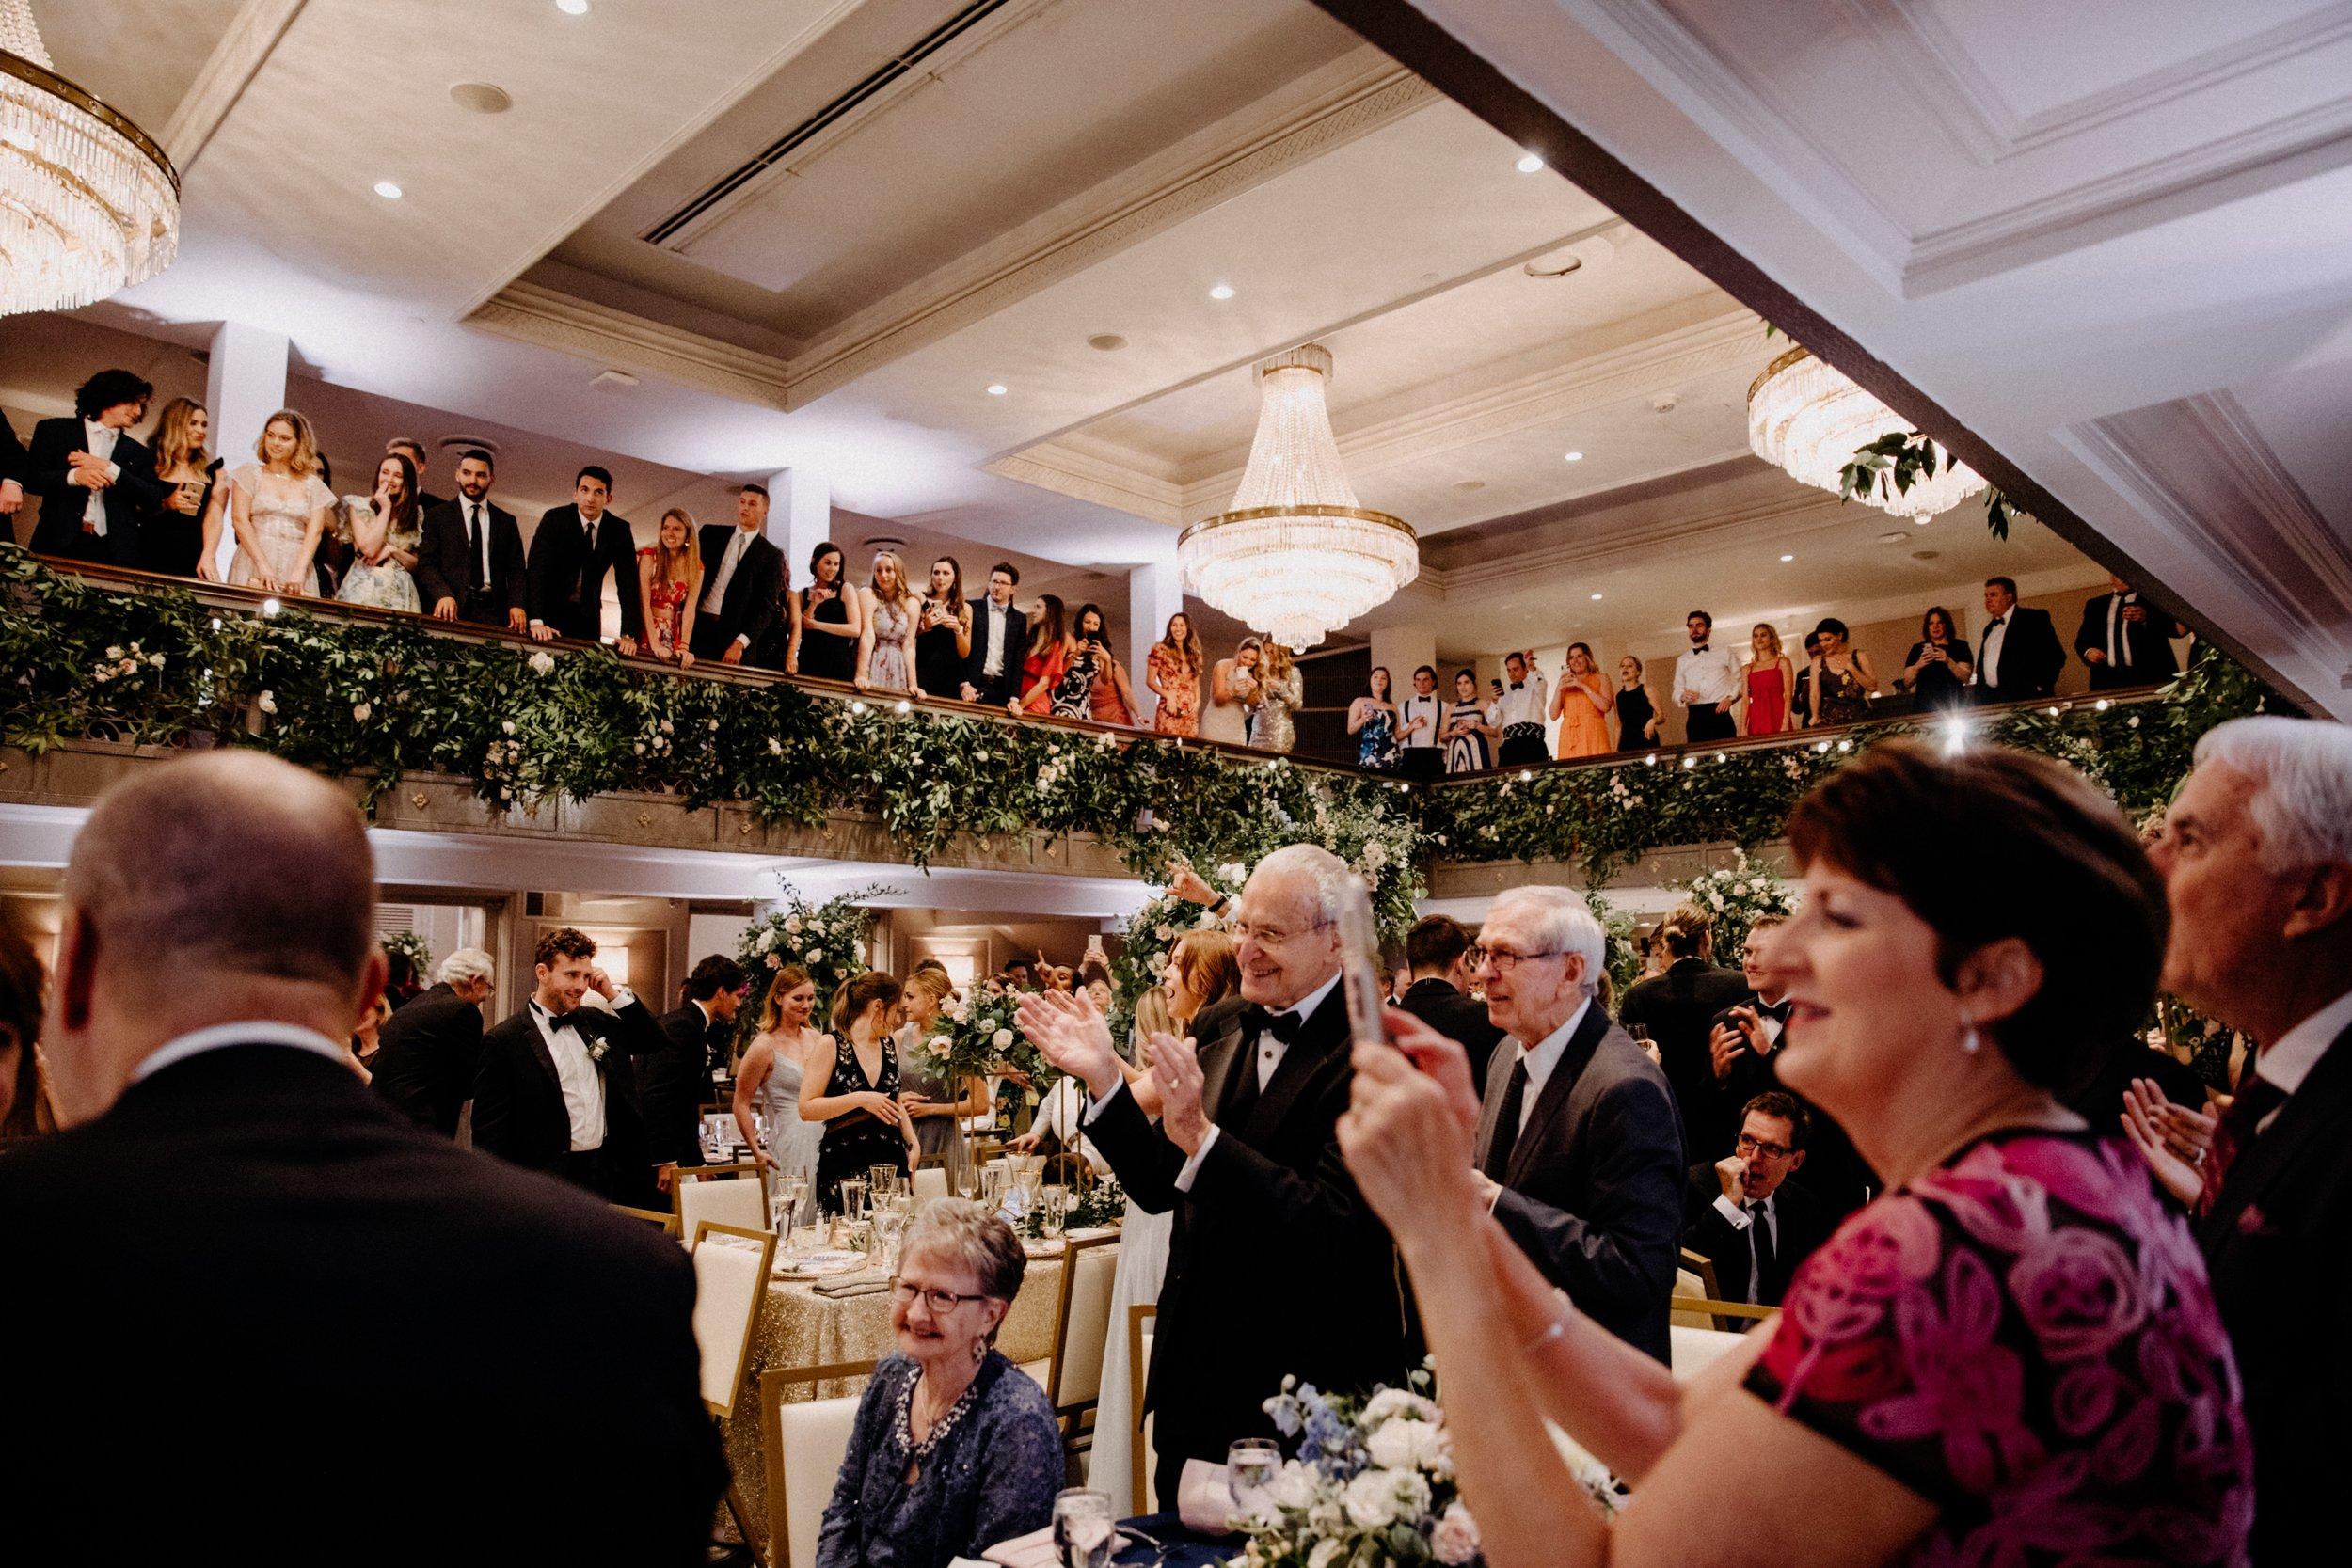 st-anthony-hotel-wedding-photography-10134san-antonio.JPG